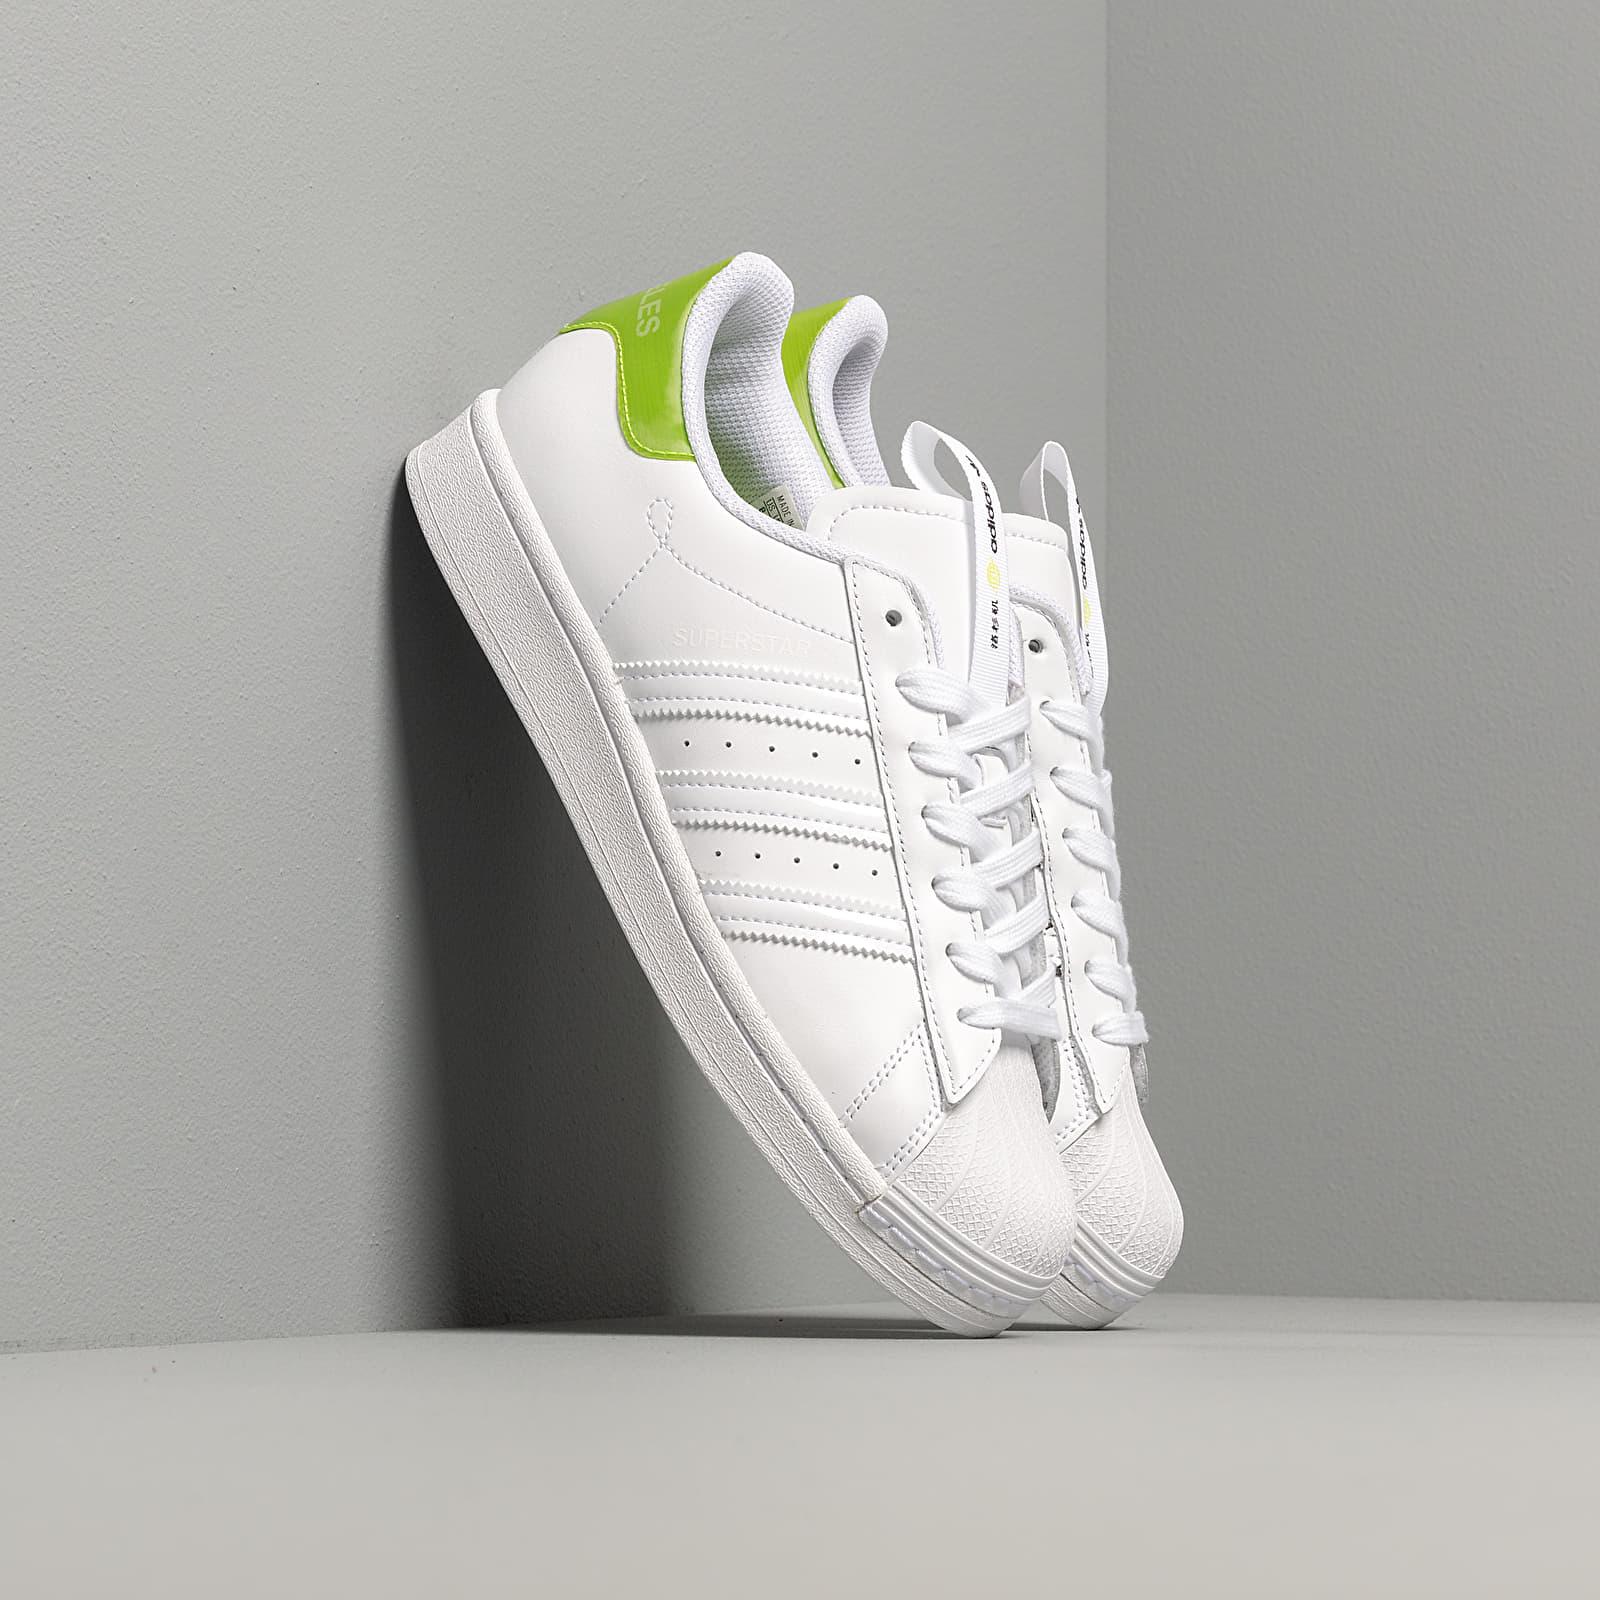 Pánské tenisky a boty adidas Superstar Ftwr White/ Ftwr White/ Core Black